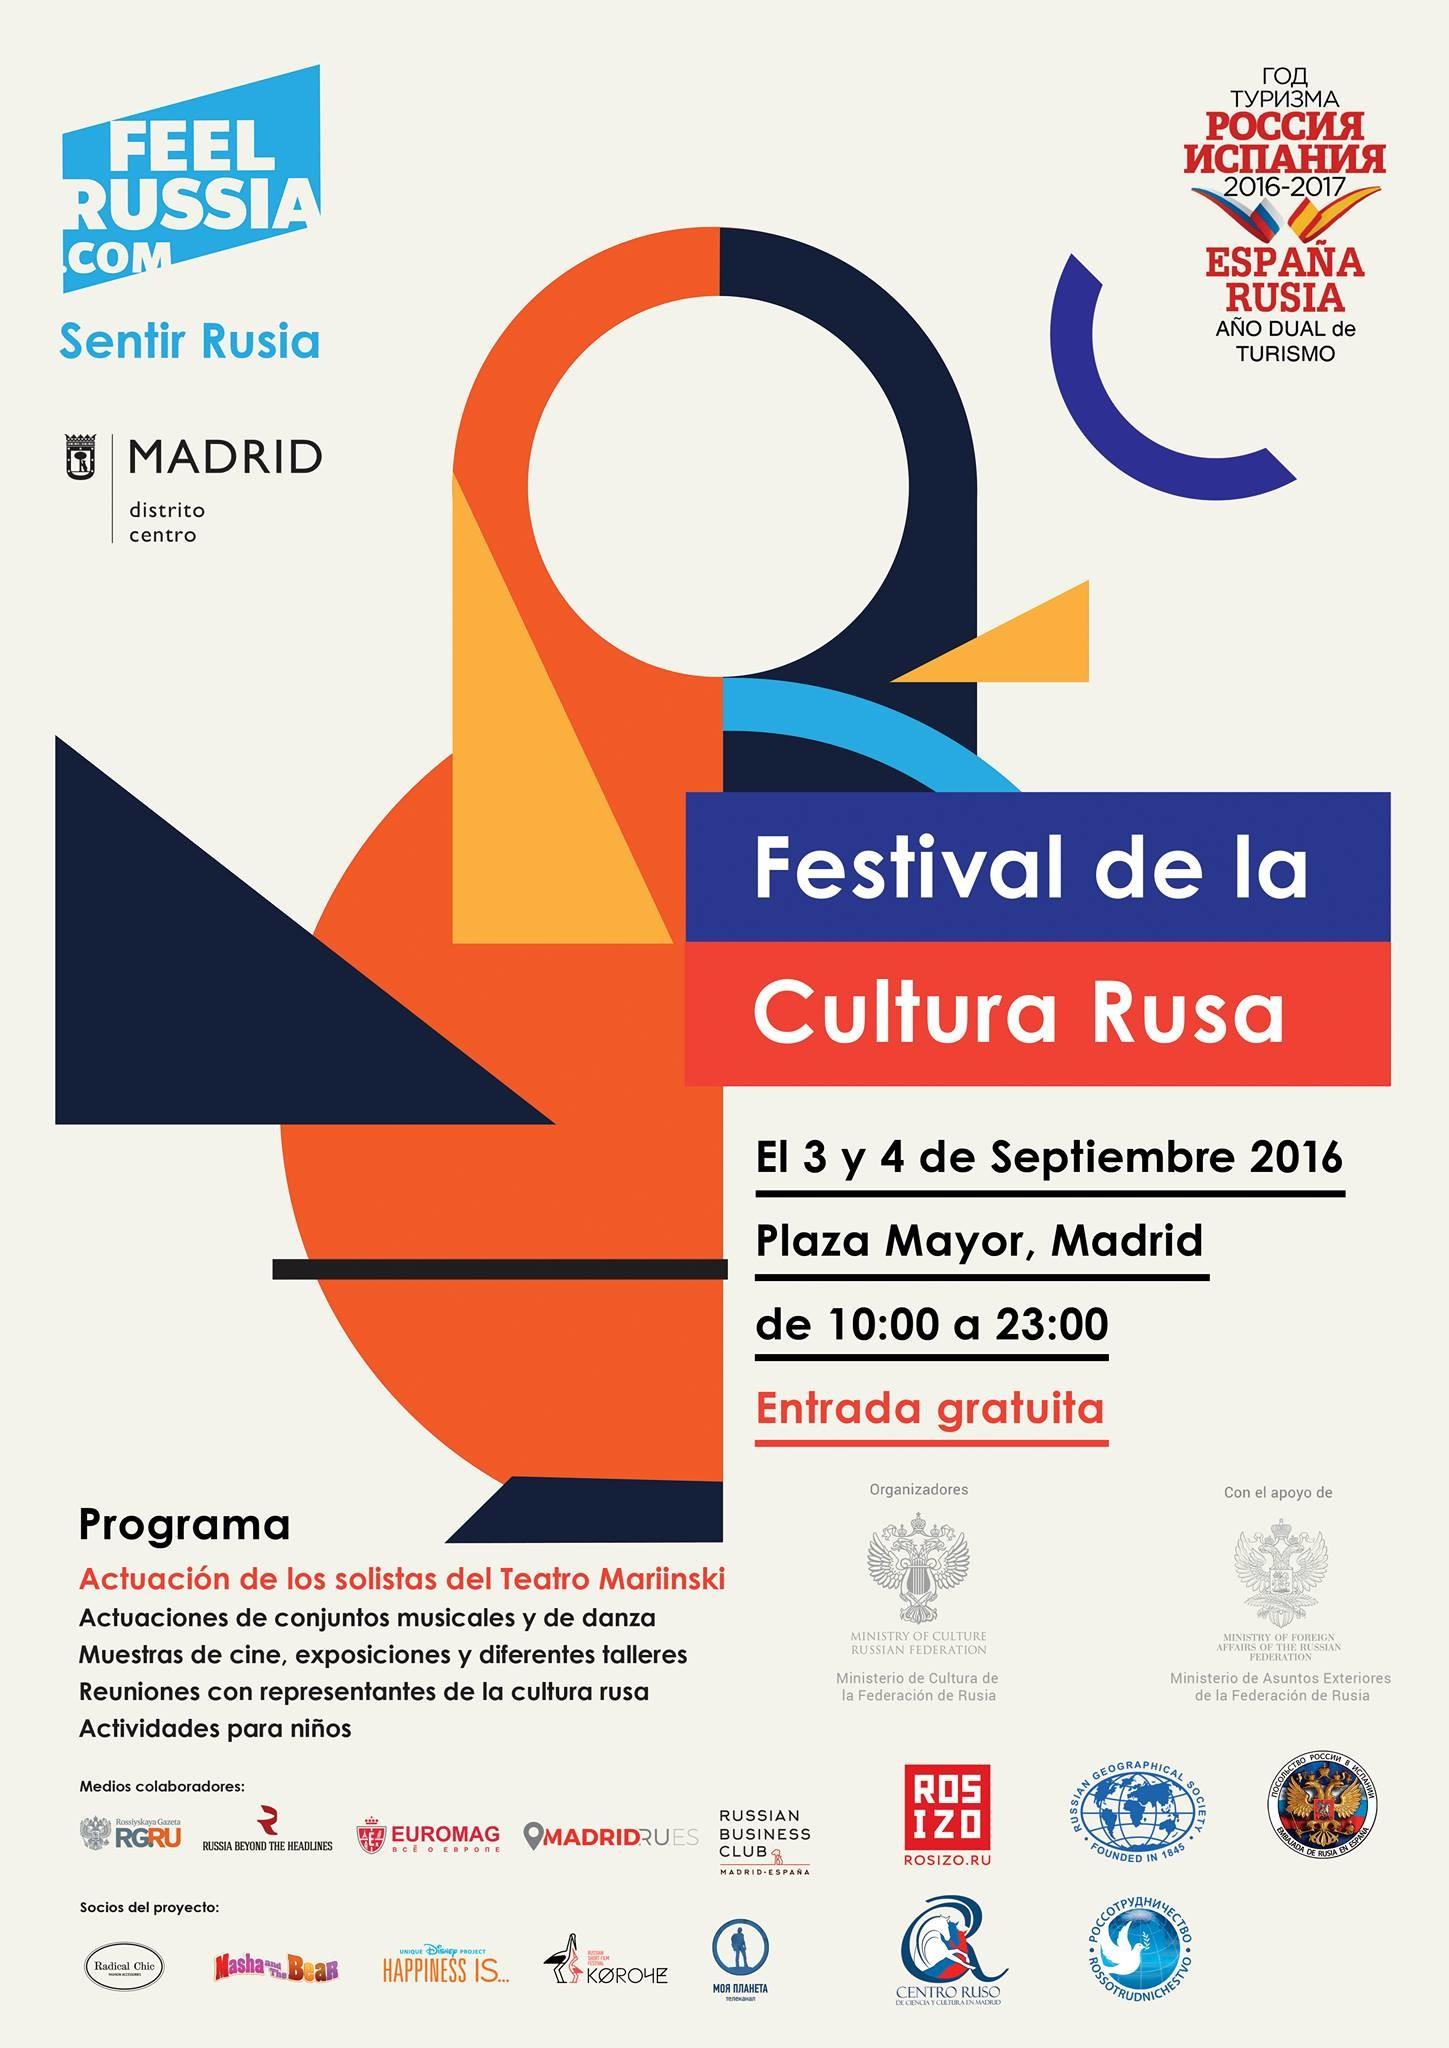 Cartel del festival